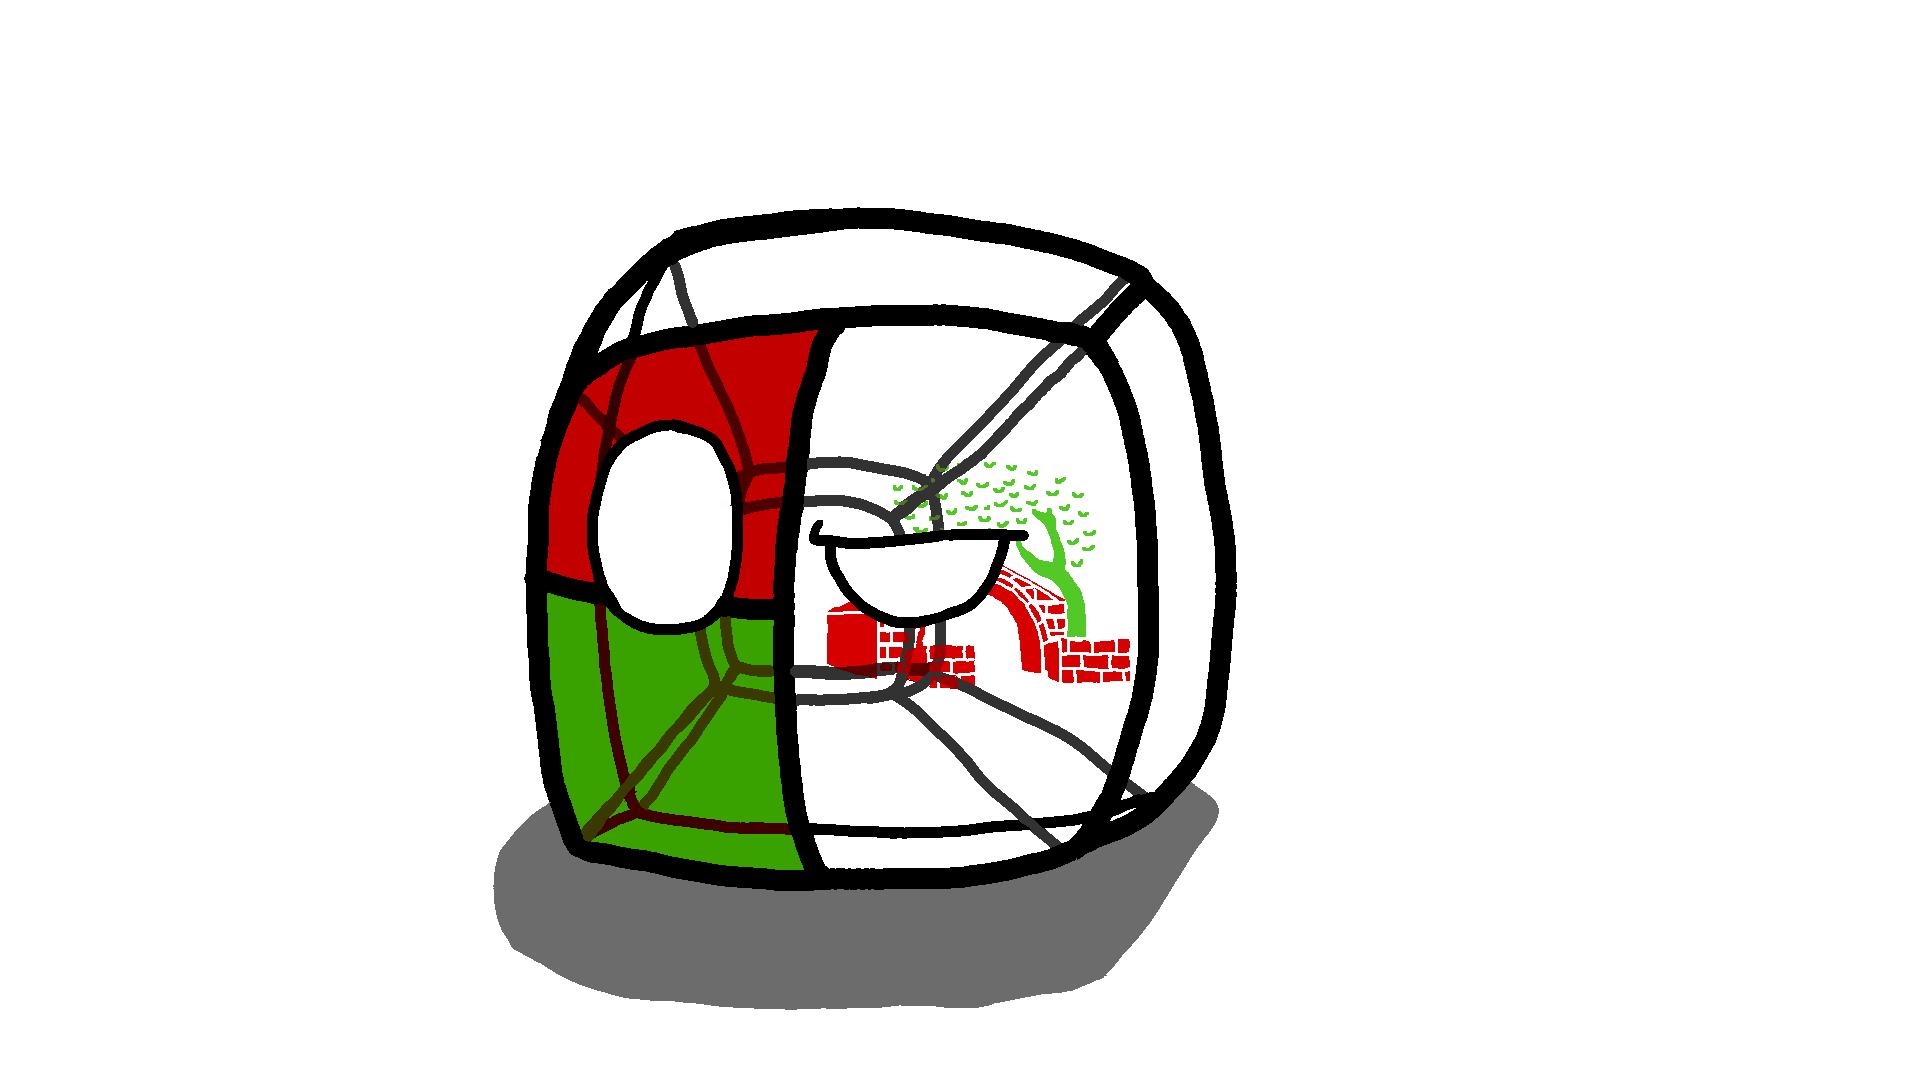 Nazarethcube